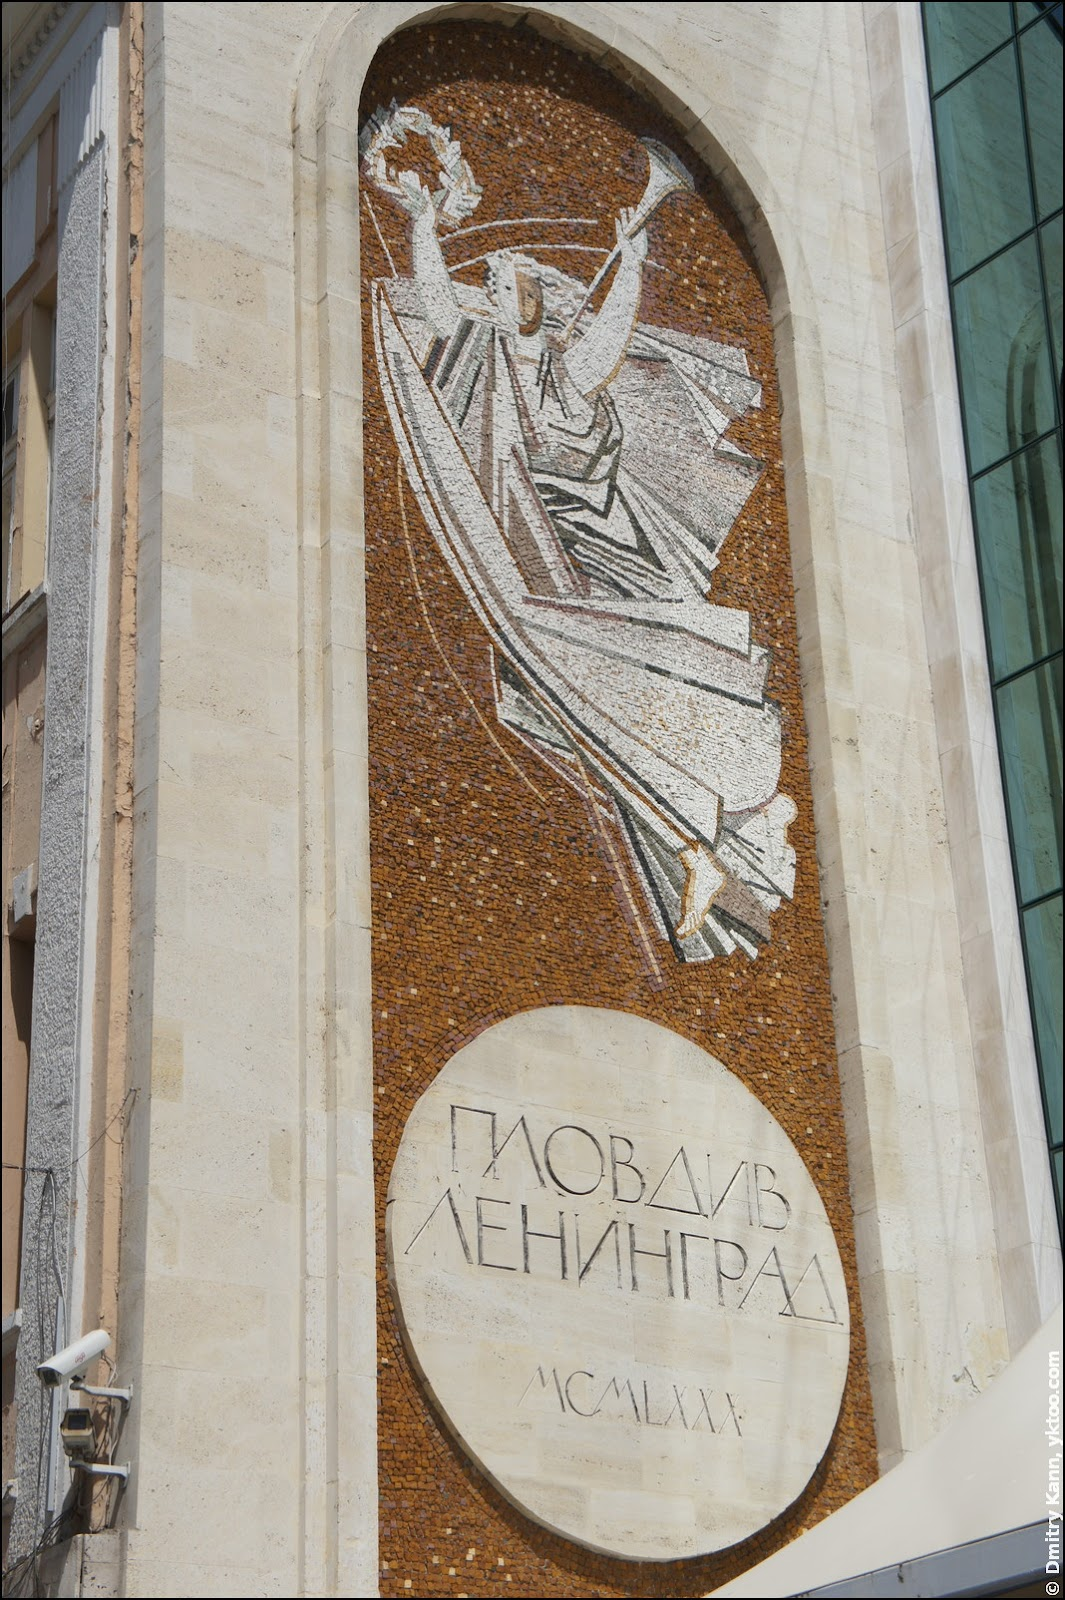 'Plovdiv-Leningrad 1980.'